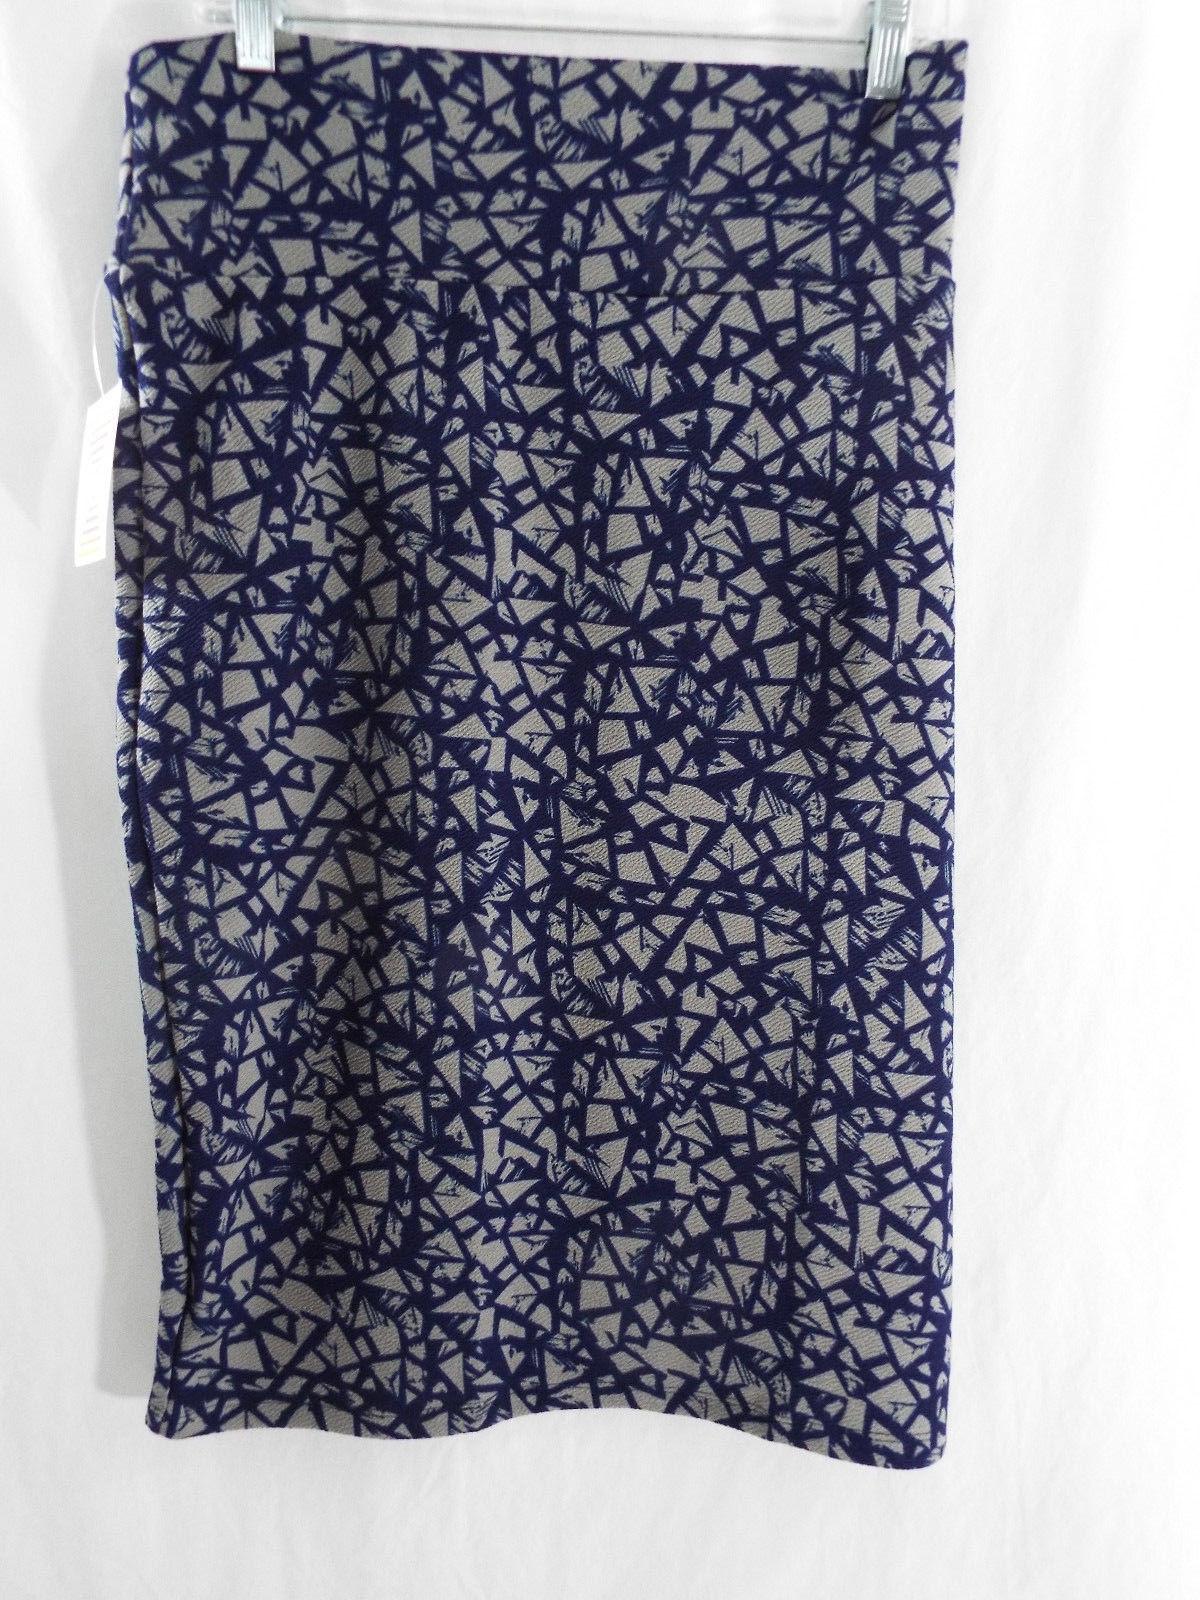 Womens LuLaRoe Cassie Skirt 3XL Gray Dark Blue Abstract NWT - $37.02